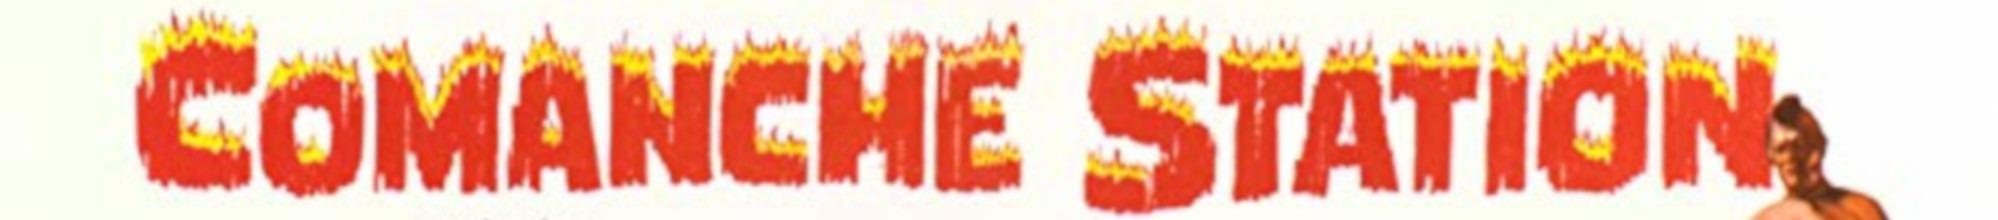 Comanche Station Banner